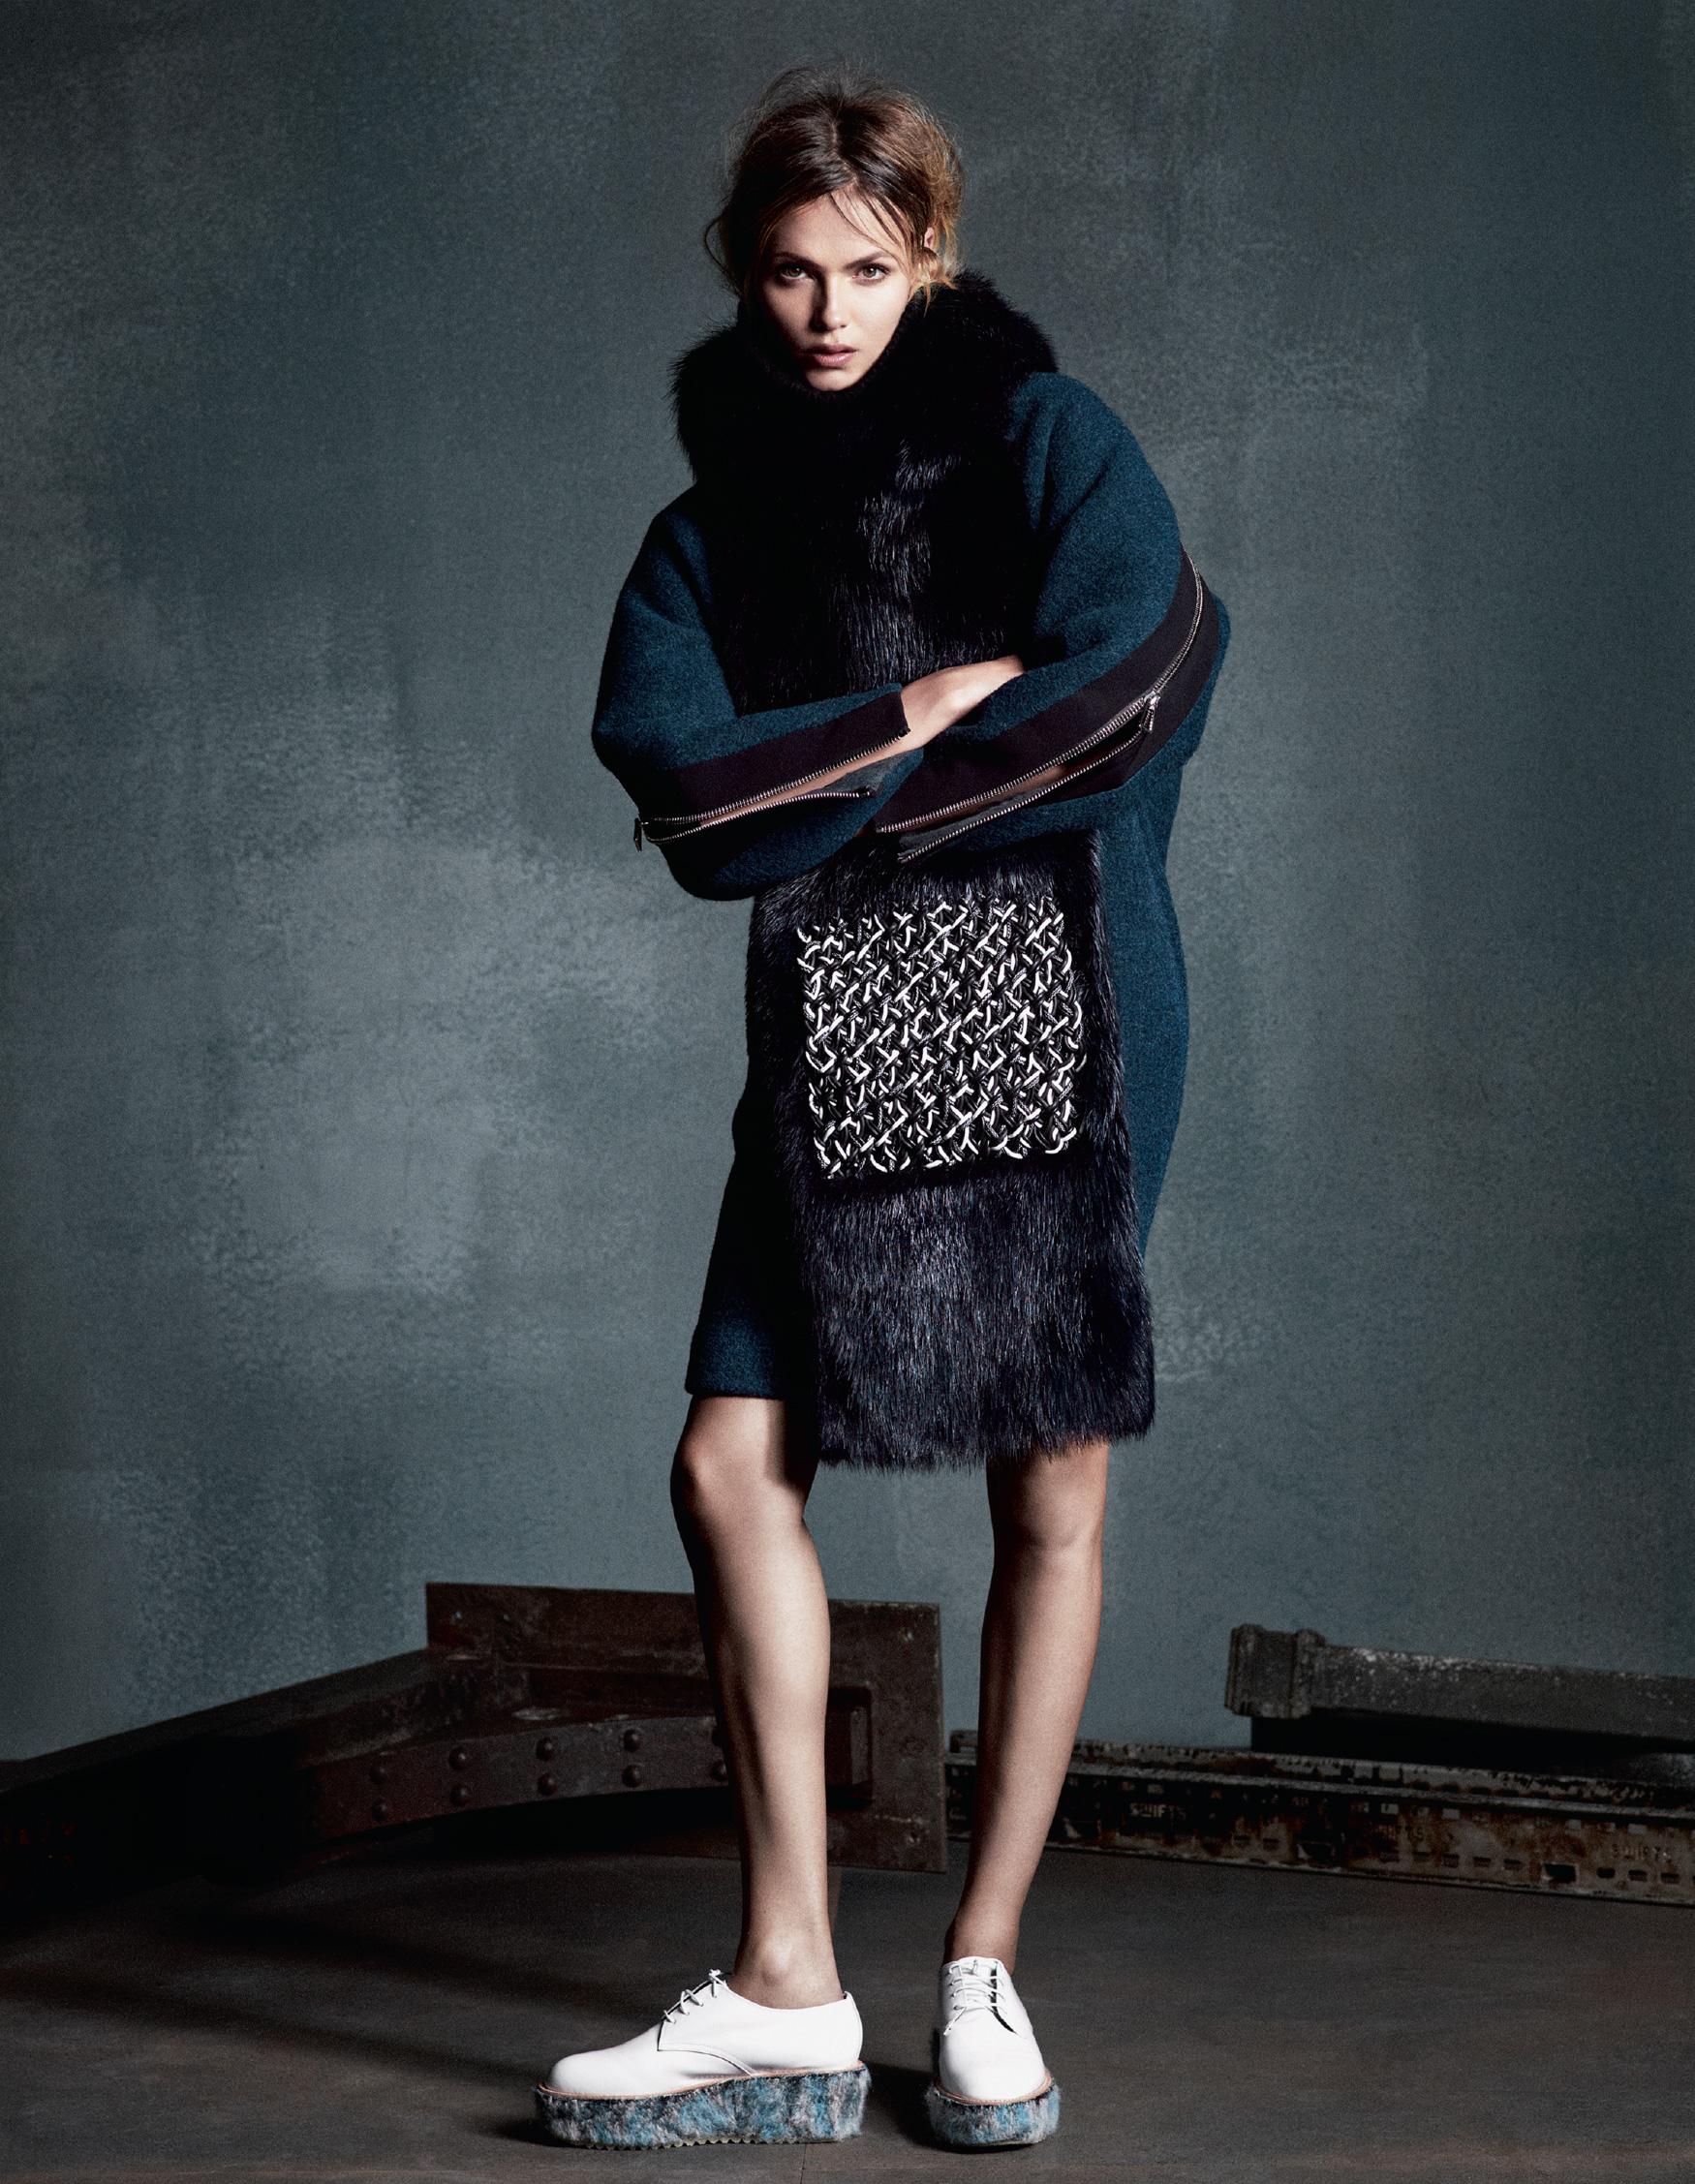 Giovanna-Battaglia-The-Icons-Of-Perfections-Vogue-Japan-15th-Anniversary-Issue-Luigi-Iango-V181_261_200-7.jpg